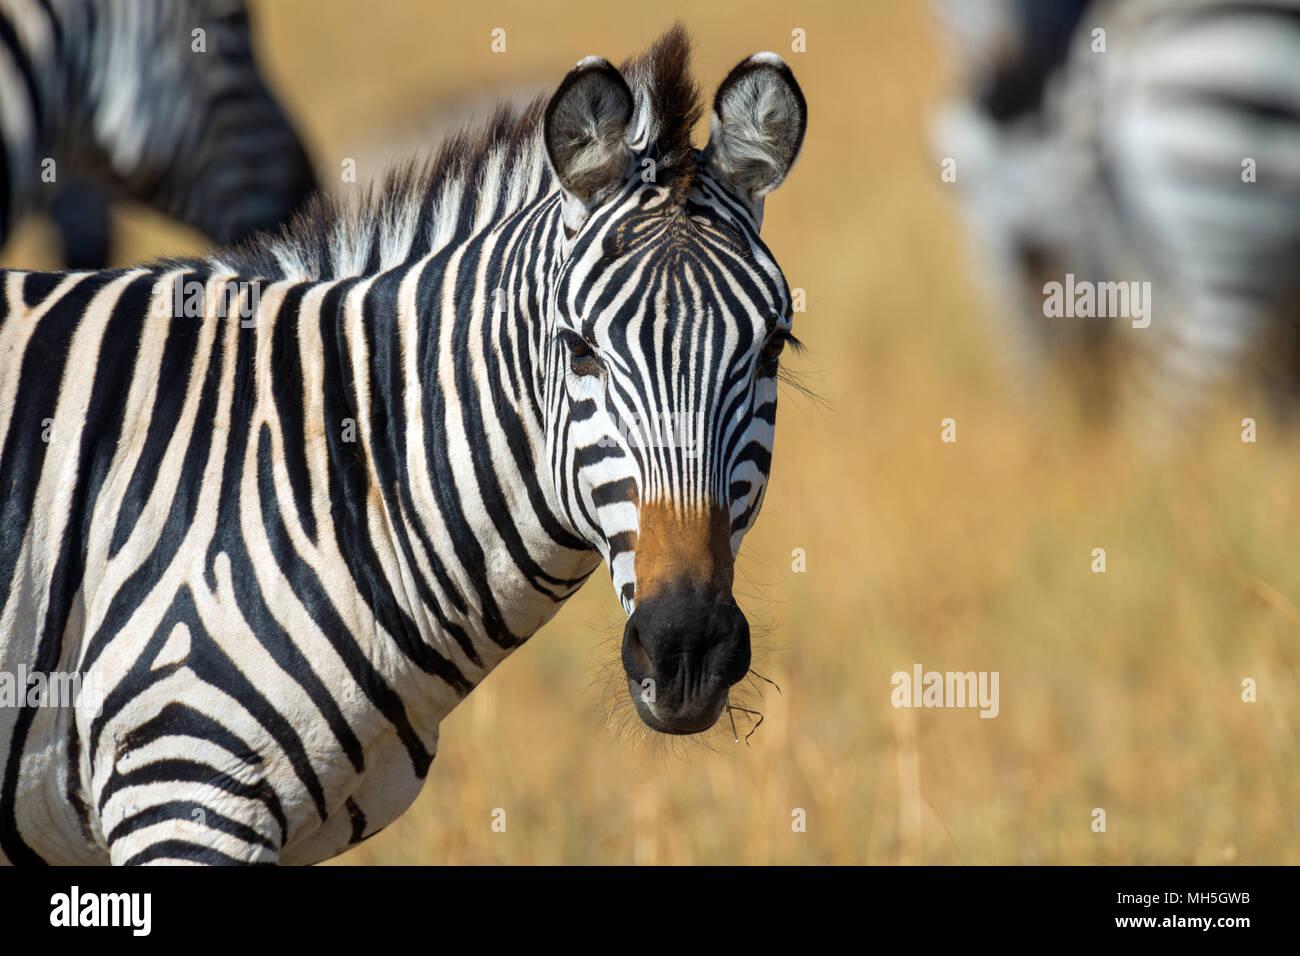 Zebra on grassland in Africa, National park of Kenya Stock Photo